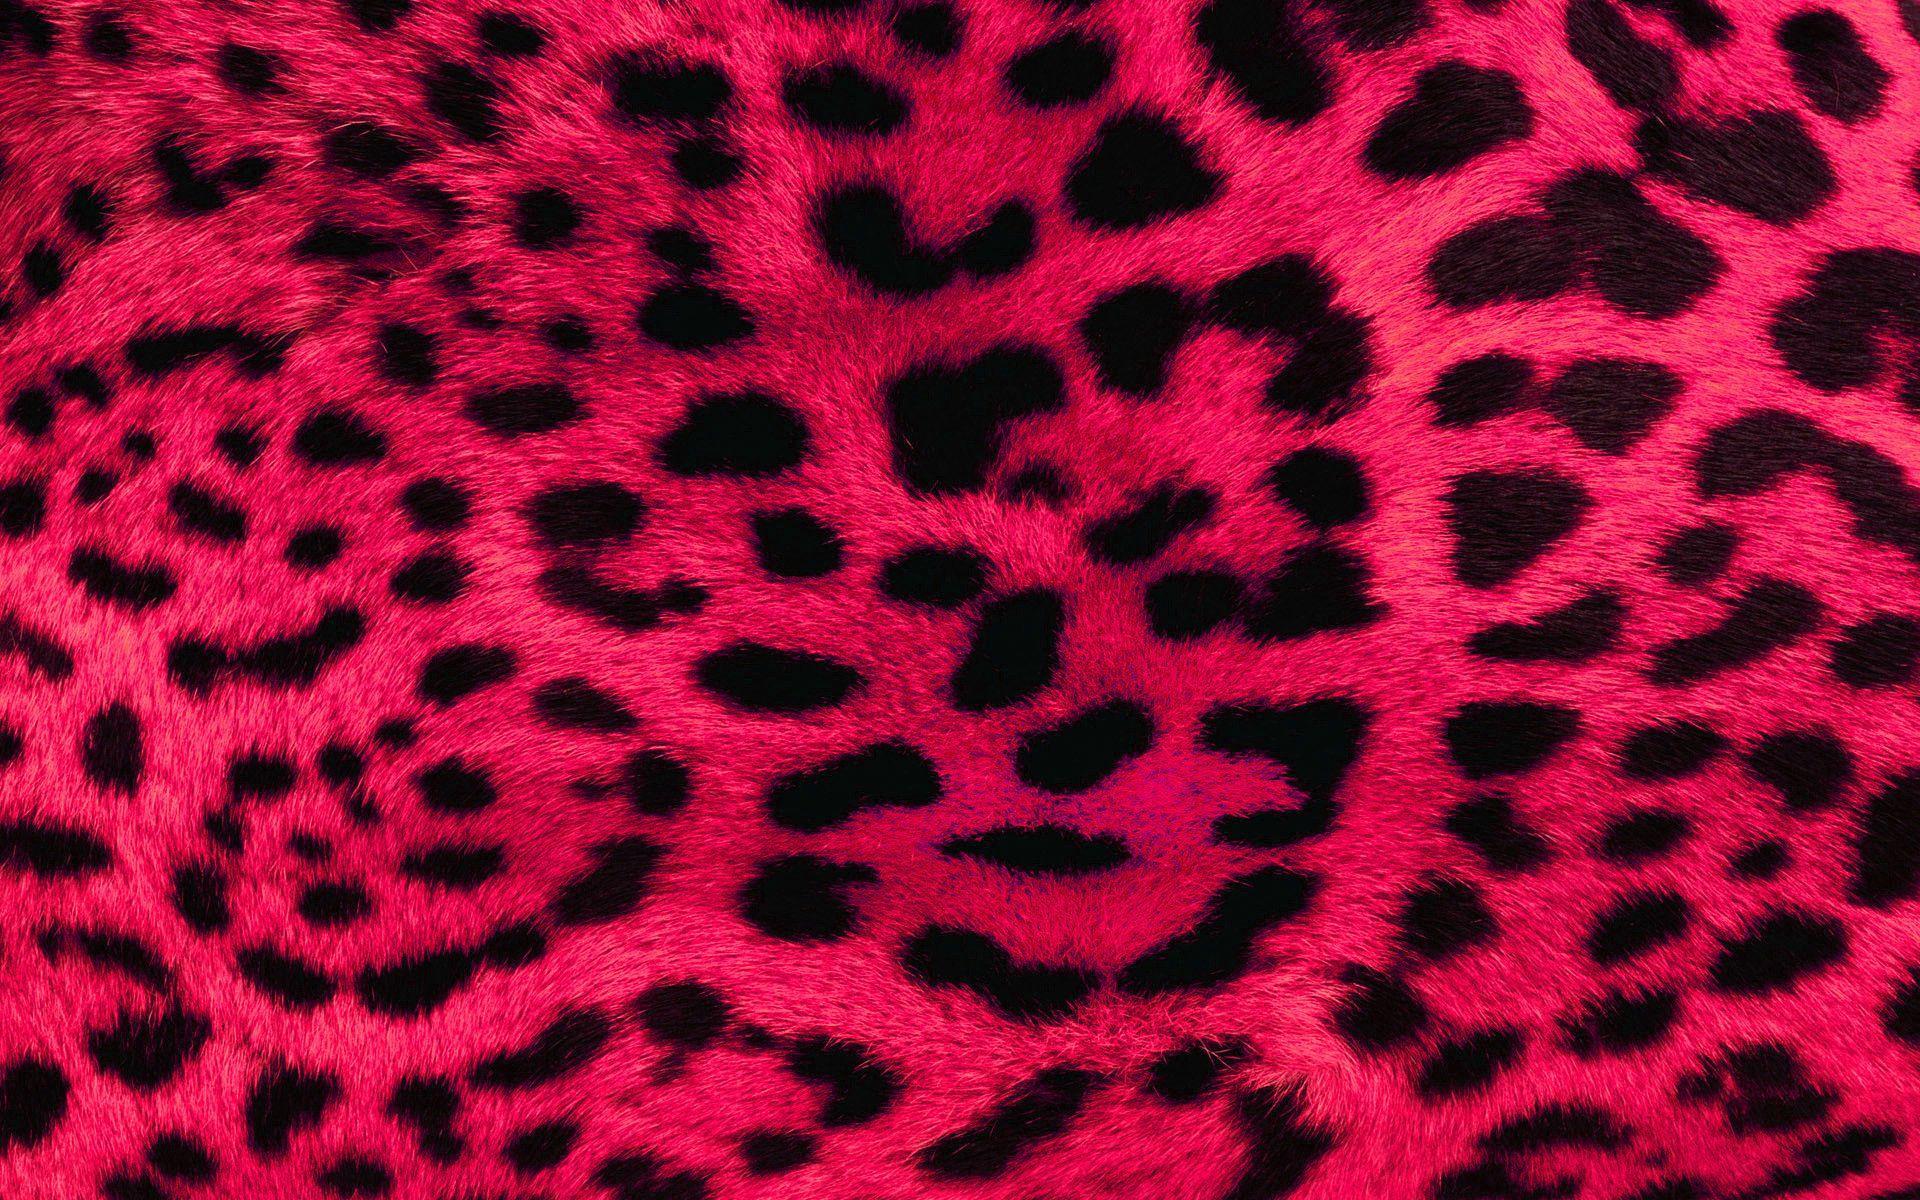 1920x1200 Pink Leopard hình nền